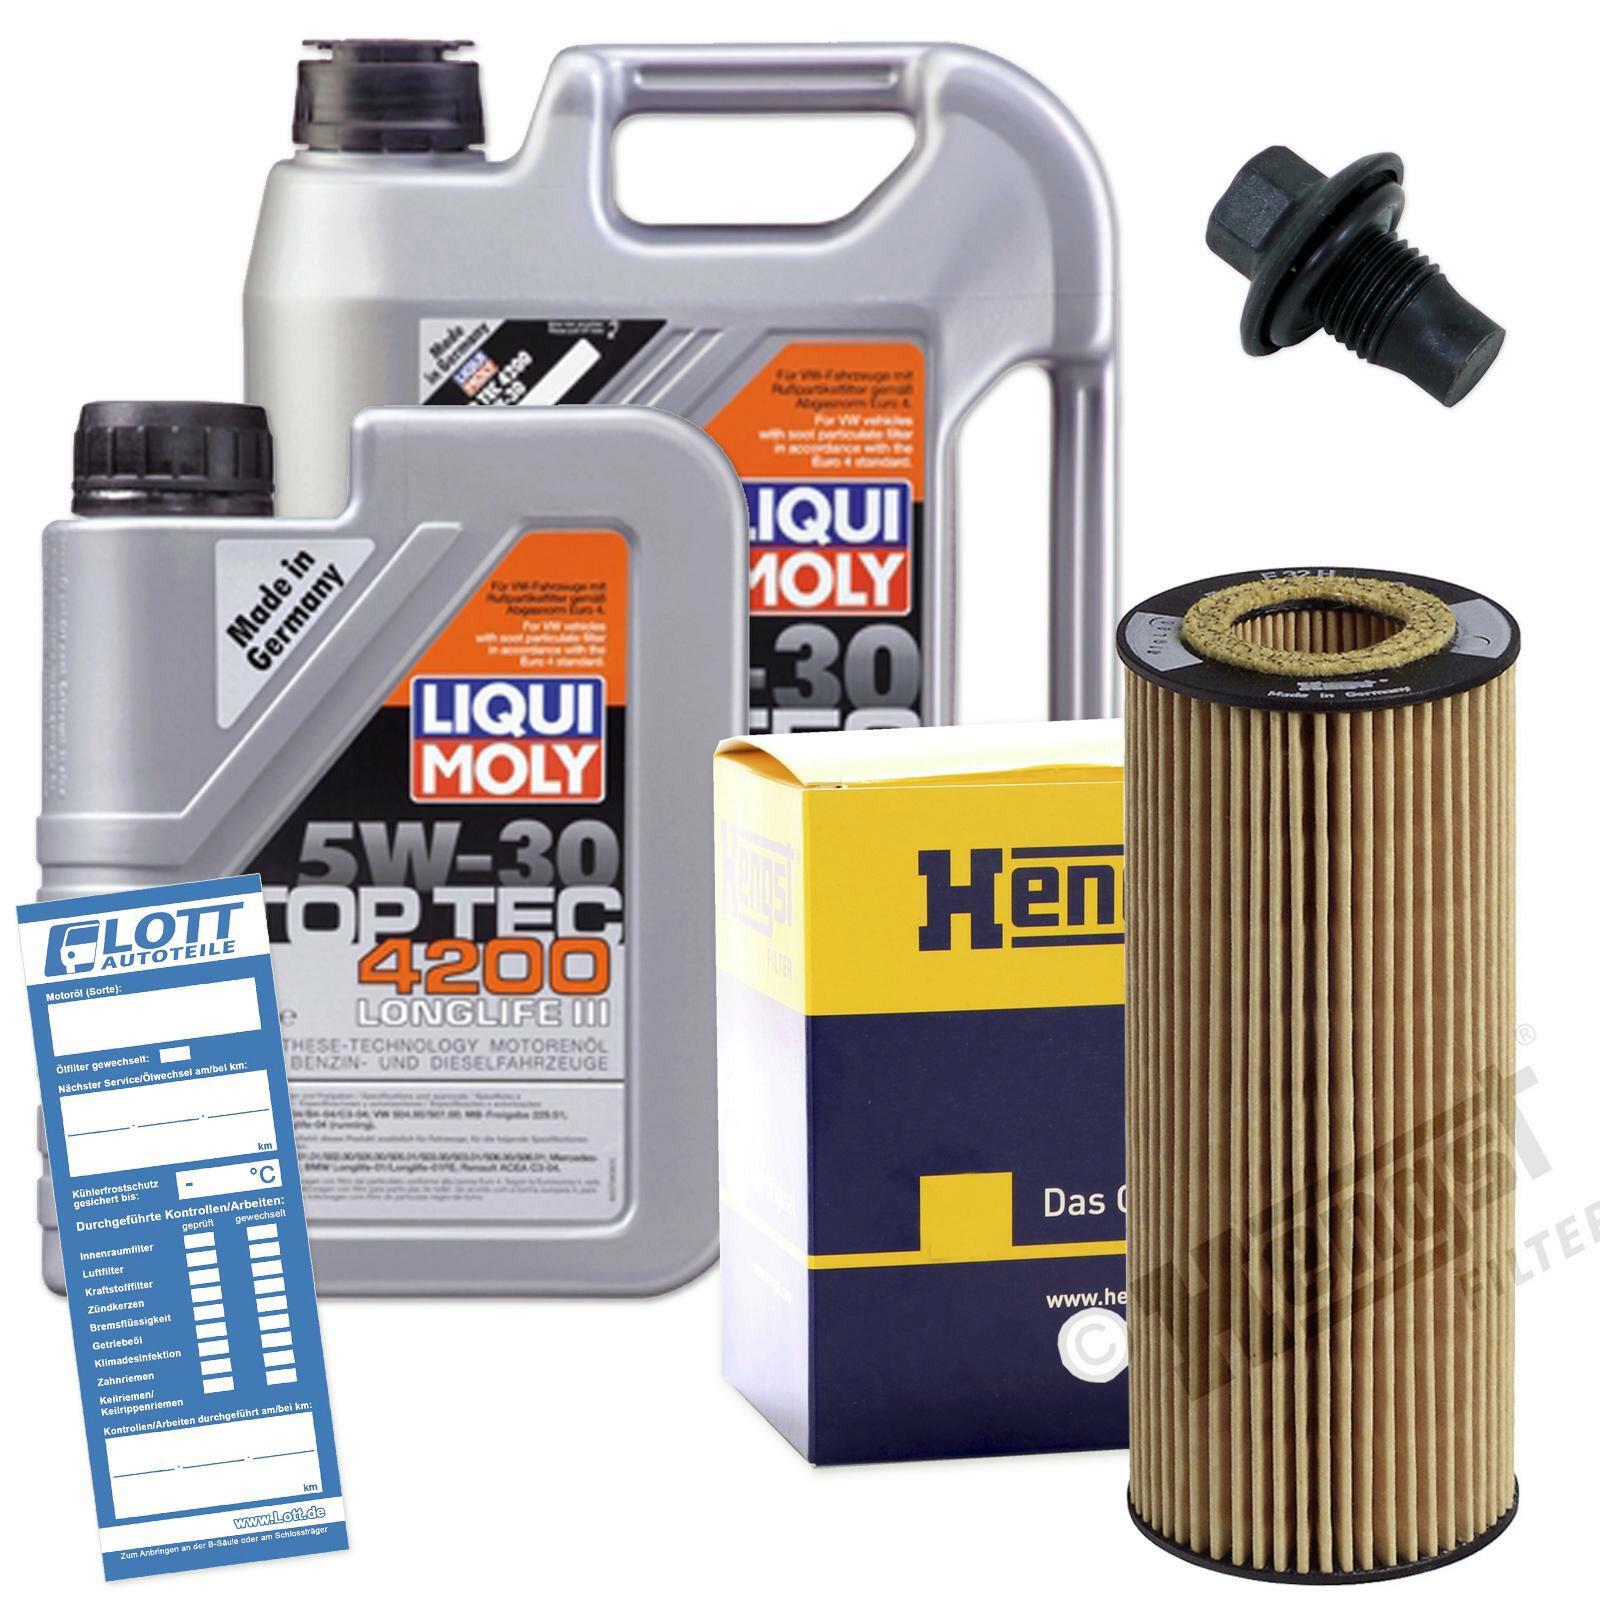 Ölwechsel Set 6L 5W30 Öl Motoröl LIQUI MOLY + HENGST Ölfilter + Ablassschraube